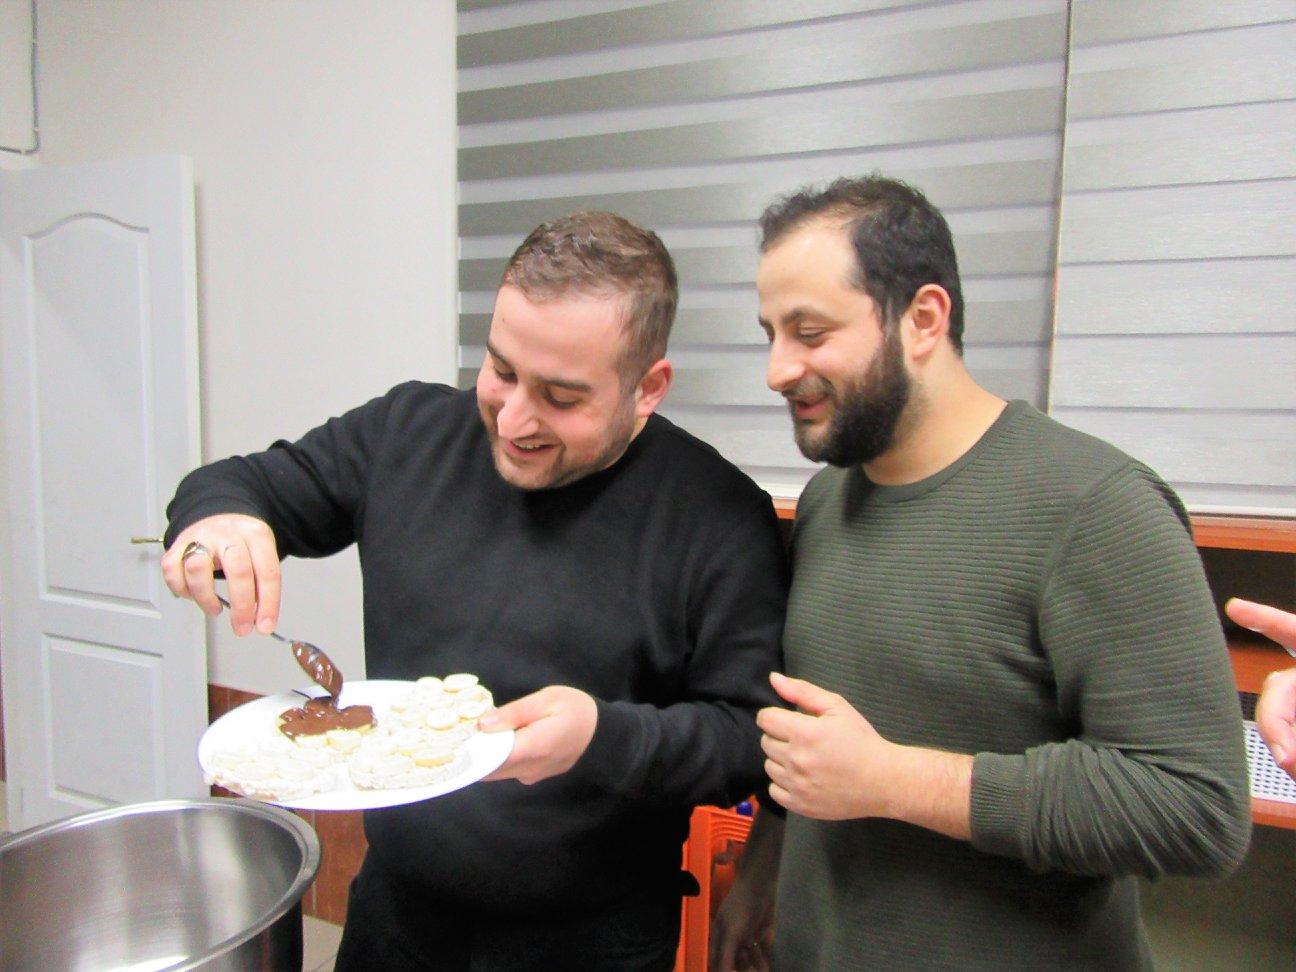 Letterbuffet_Platform integratie_Selimye Moskee feestzaal 3